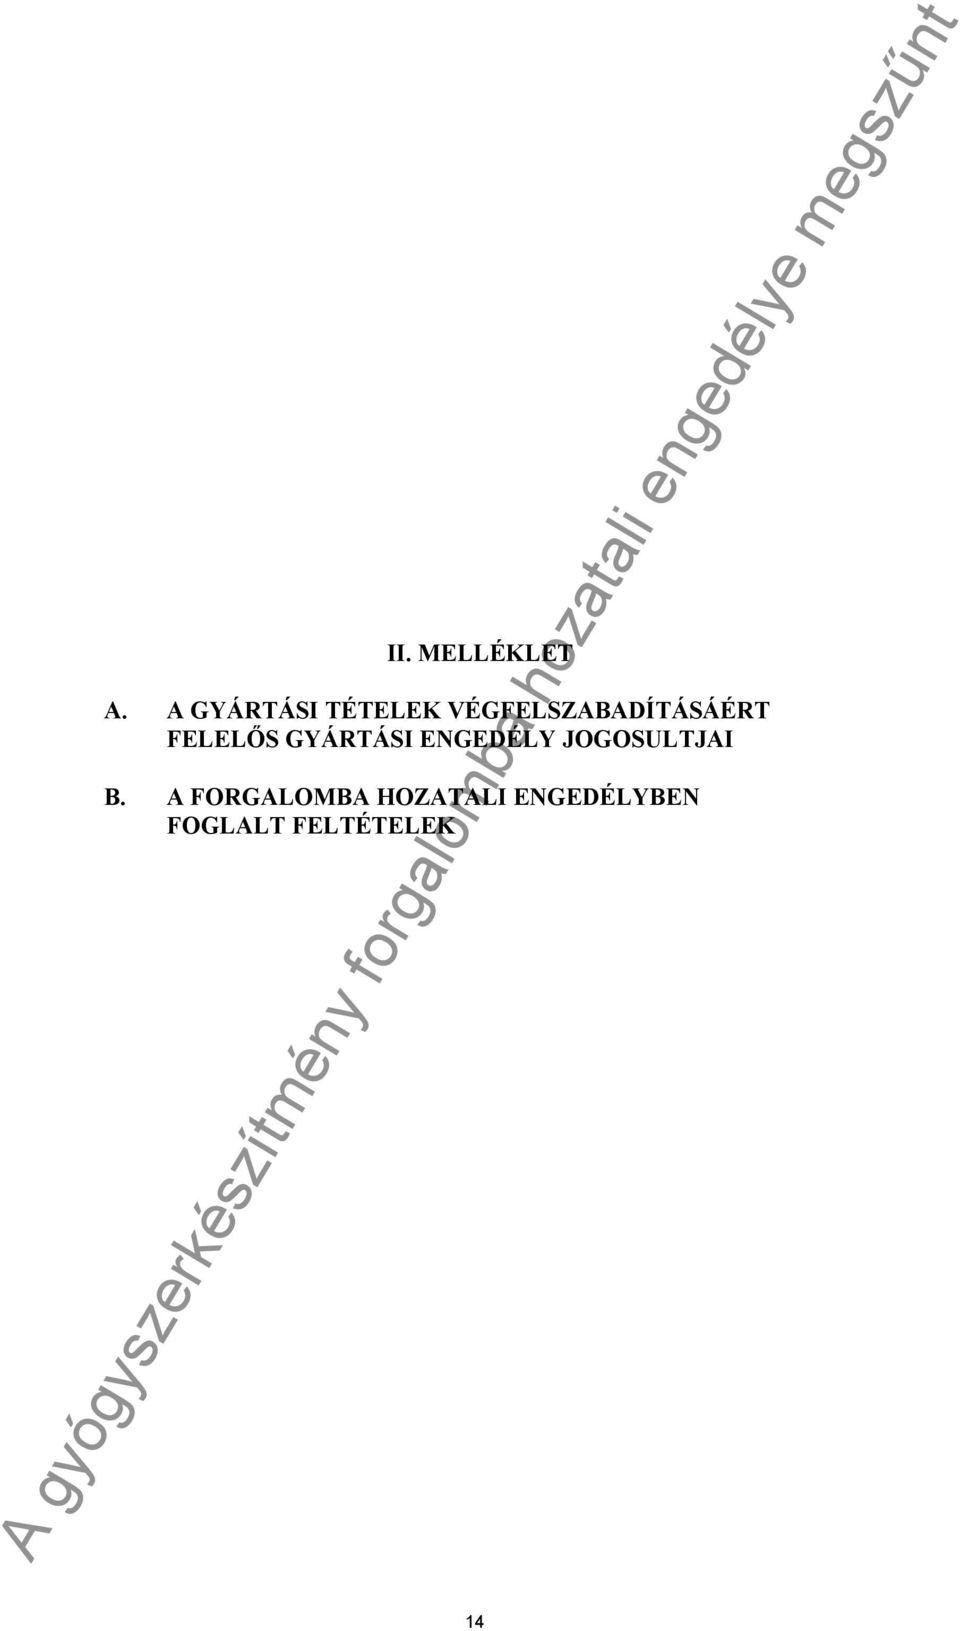 hyperhidrosis hipertóniával